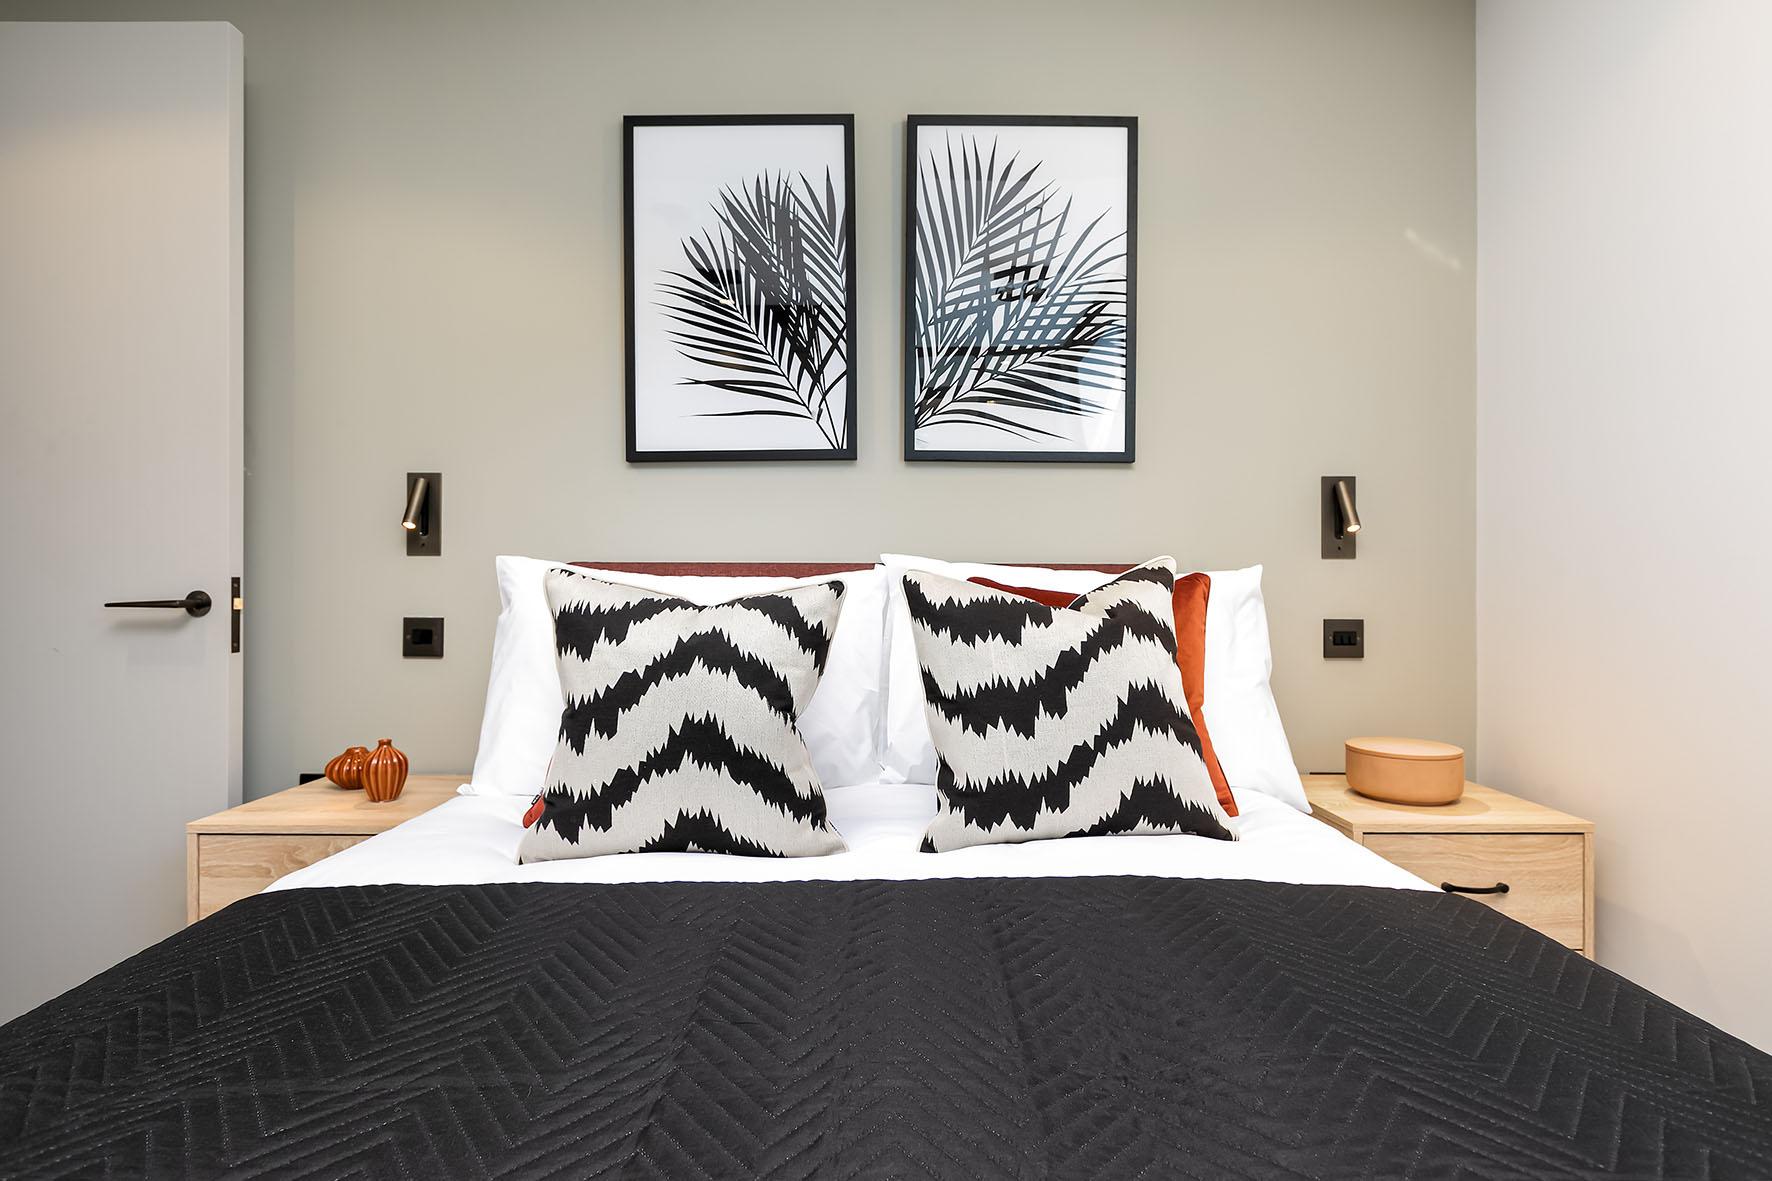 Lovelydays luxury service apartment rental - London - Soho - Oxford Street IV - Lovelysuite - 2 bedrooms - 2 bathrooms - Queen bed - 39cdb29ab22a - Lovelydays